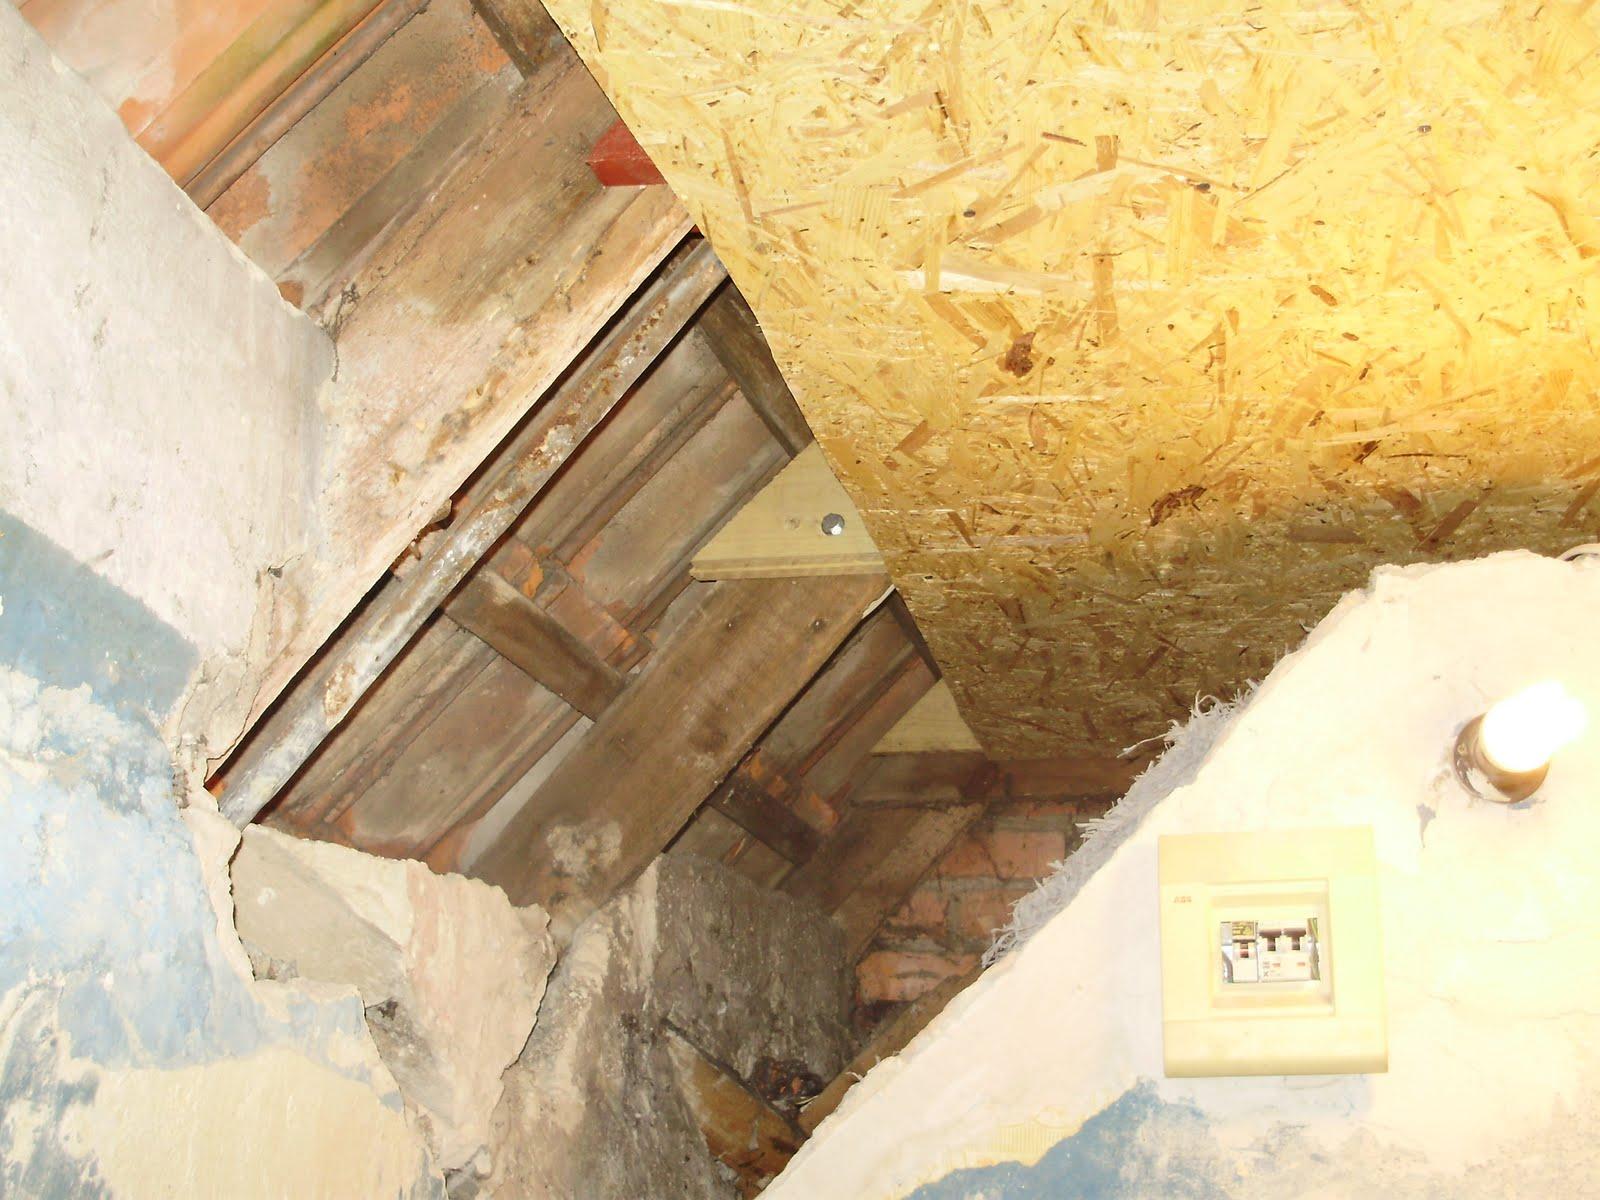 Ремонт квартиры под ключ в Ставрополе Отделка квартиры